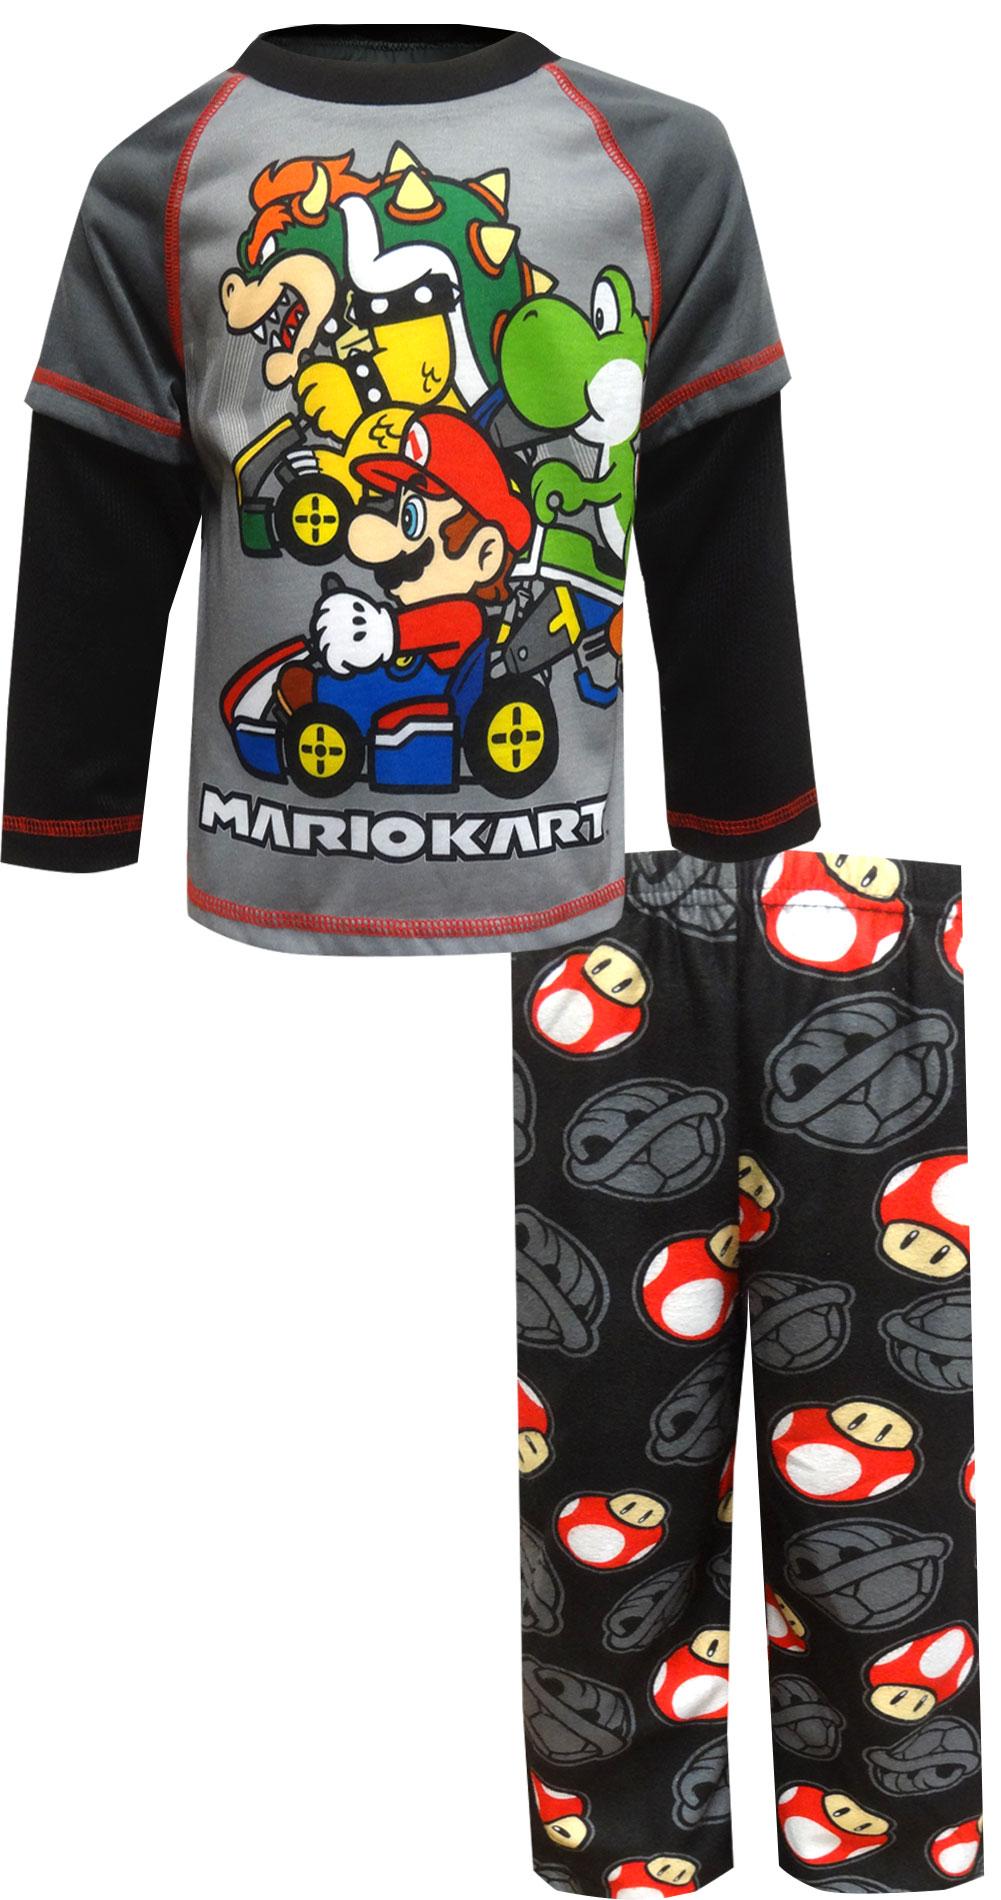 Image of MARIOKART At the Starting Line Pajamas for boys